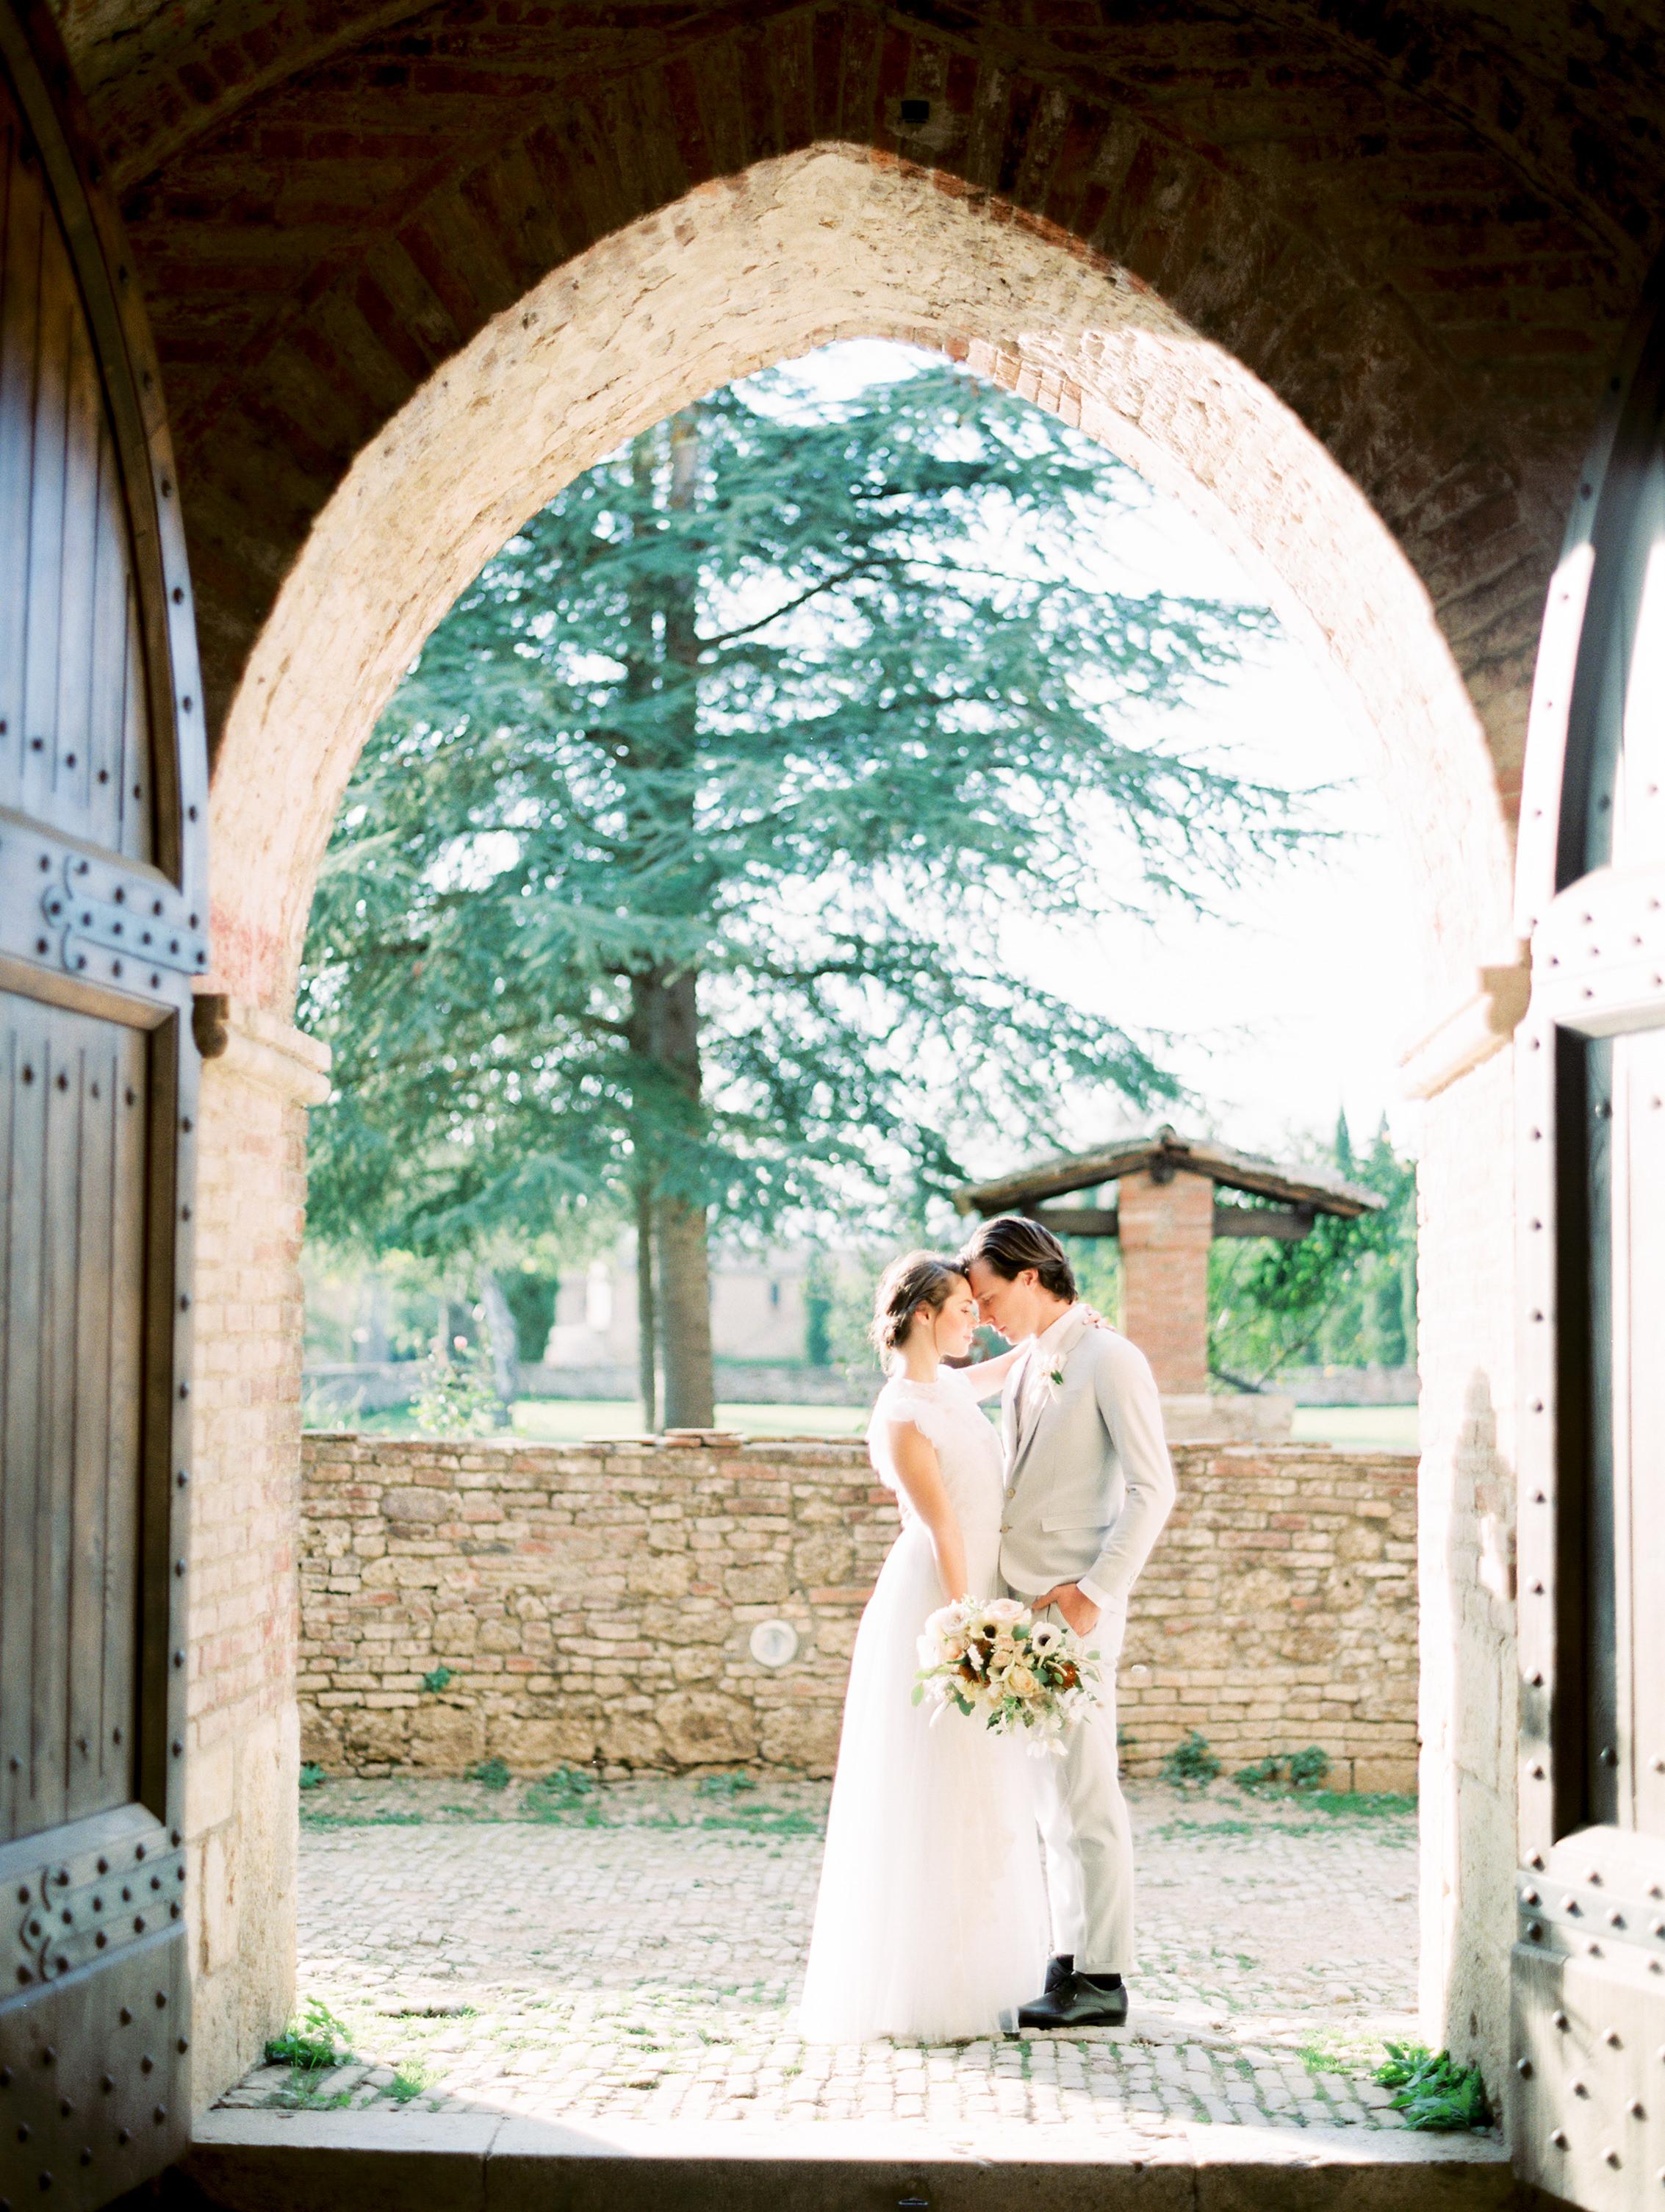 romantic-italy-wedding-in-tuscany-95.jpg